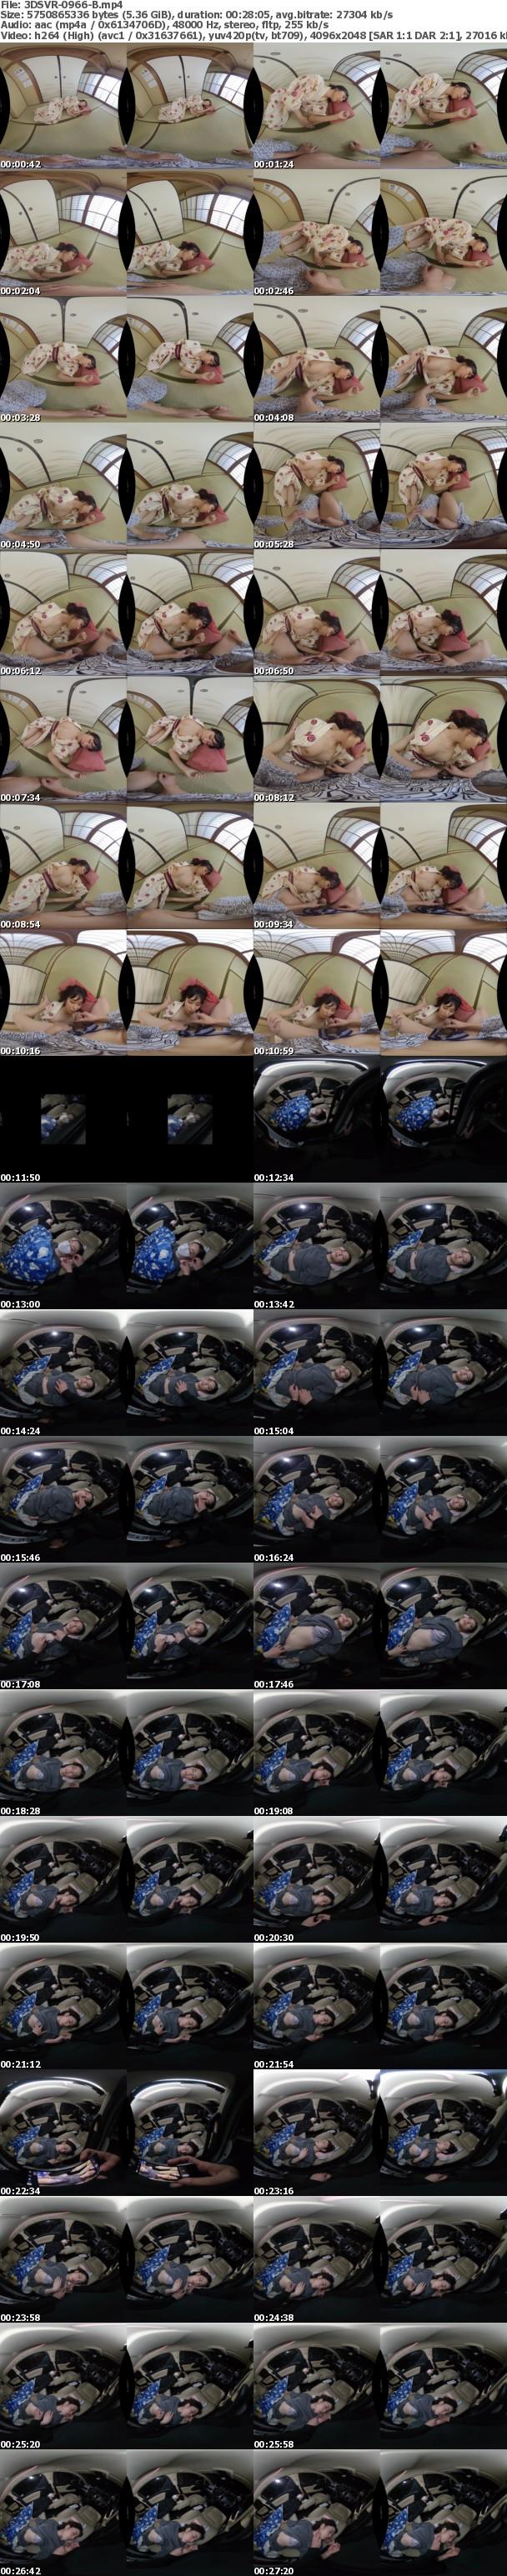 (VR) 3DSVR-0966 寝てる女子に顔射 カラオケ、ファミレス、車中泊…そこら辺で寝てる女子に顔射して猛ダッシュで逃げた結果www【全編ワイの本物ザーメンお顔発射www】